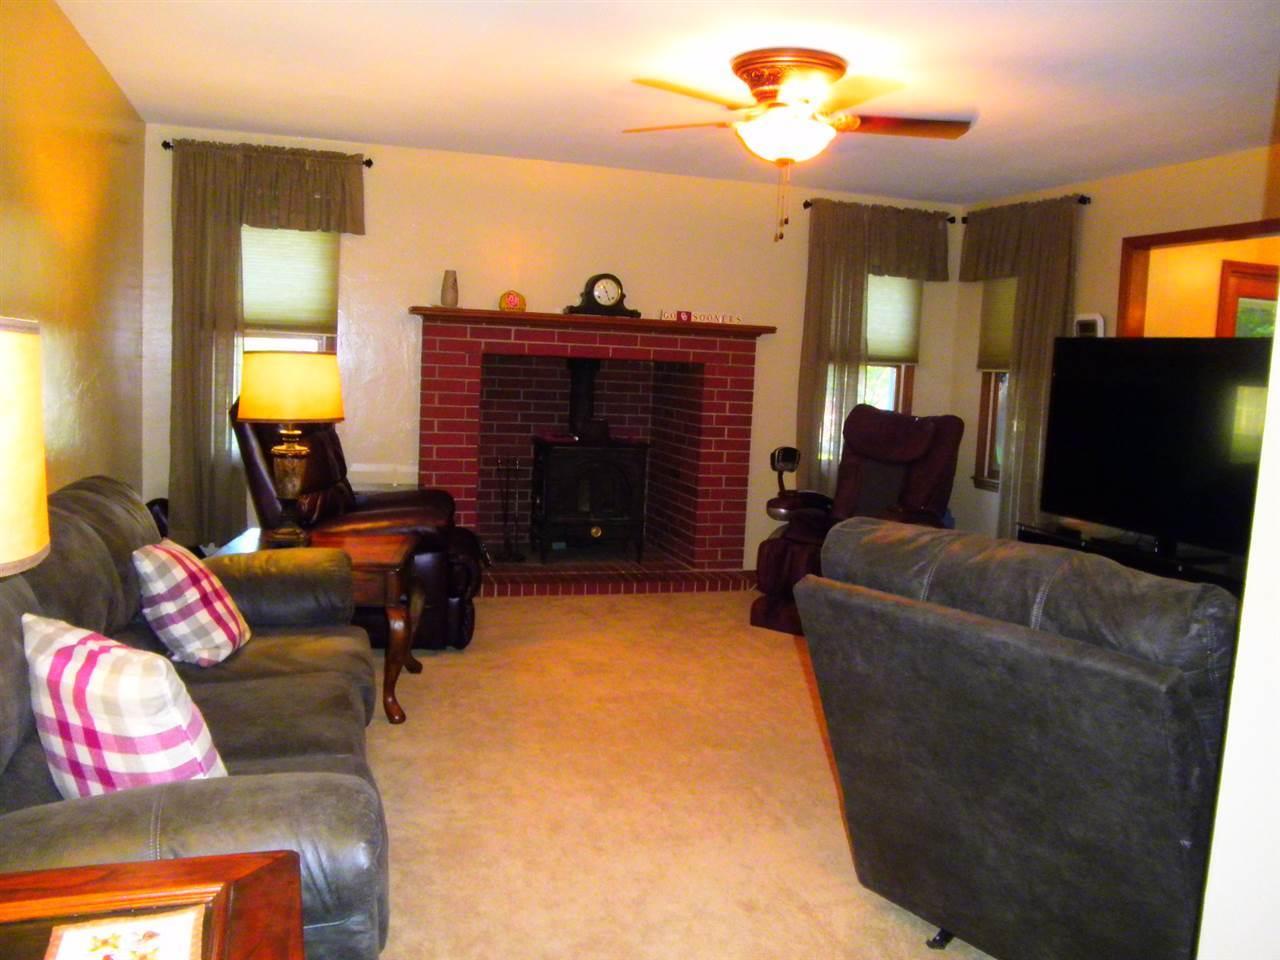 Sold Cross Sale W/ MLS | 32 Raintree Ponca City, OK 74604 2